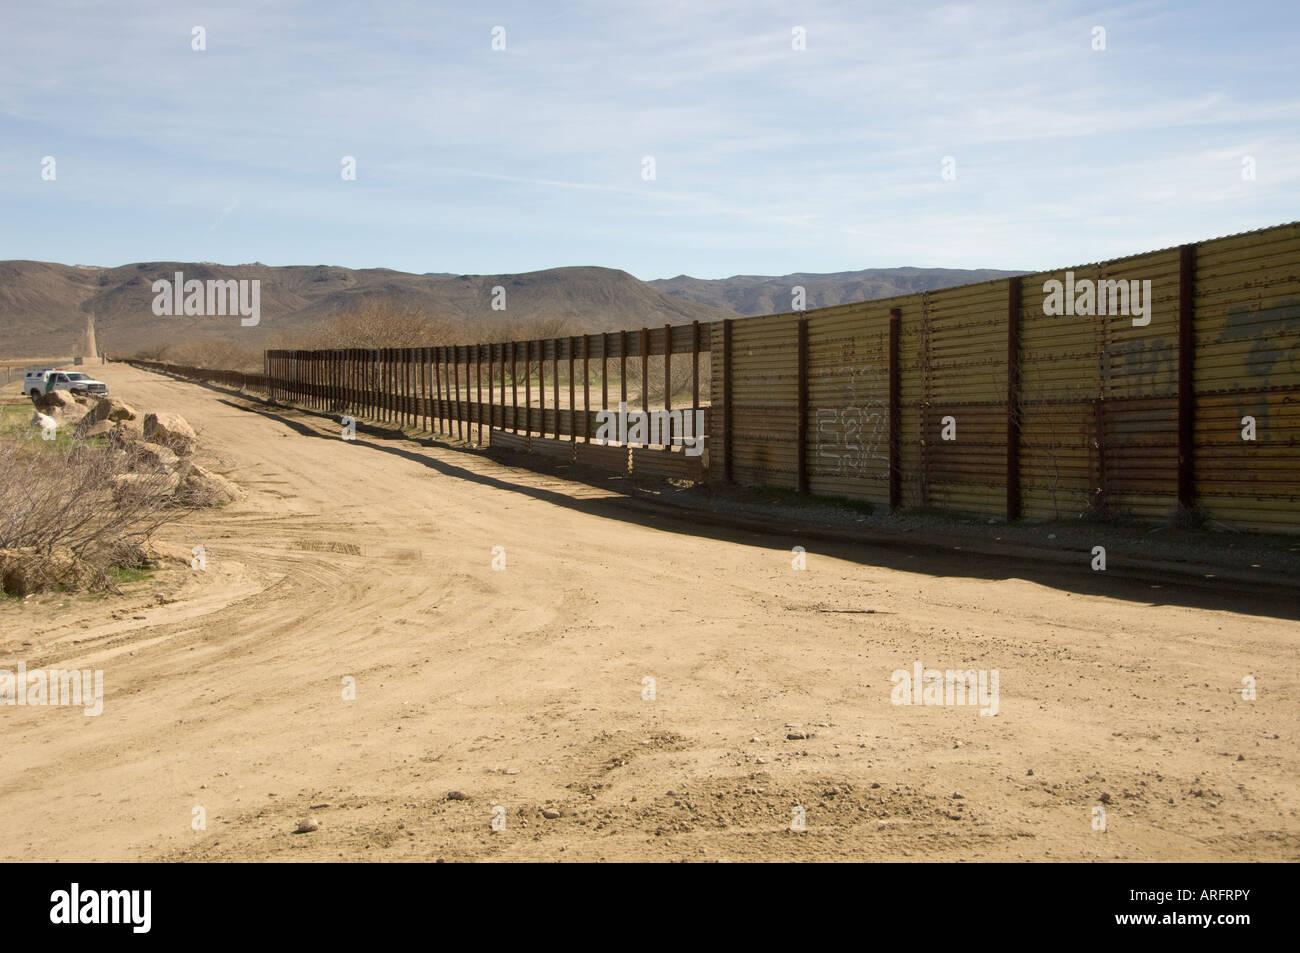 Mexico Border Fence with Holes at Jacumba, California - Stock Image